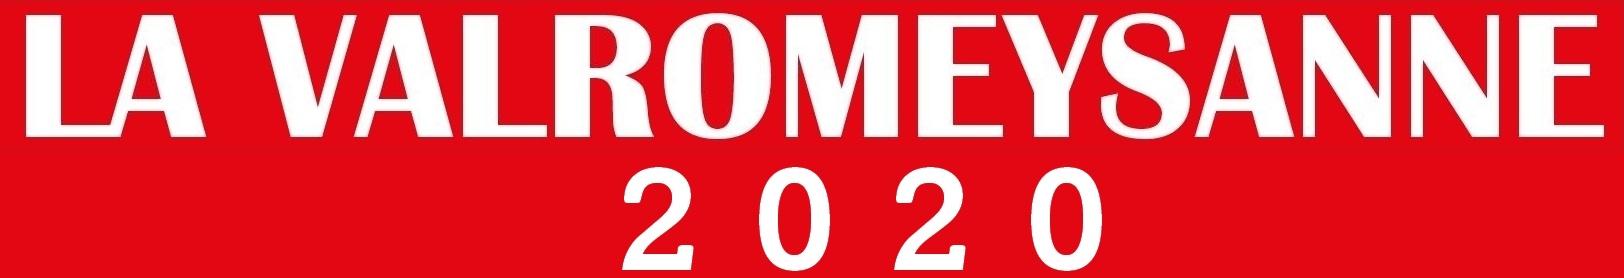 Calendrier Des Randonnees Pedestres Dans Lain 2020.La Valromeysanne 2020 Valromey Cyclo